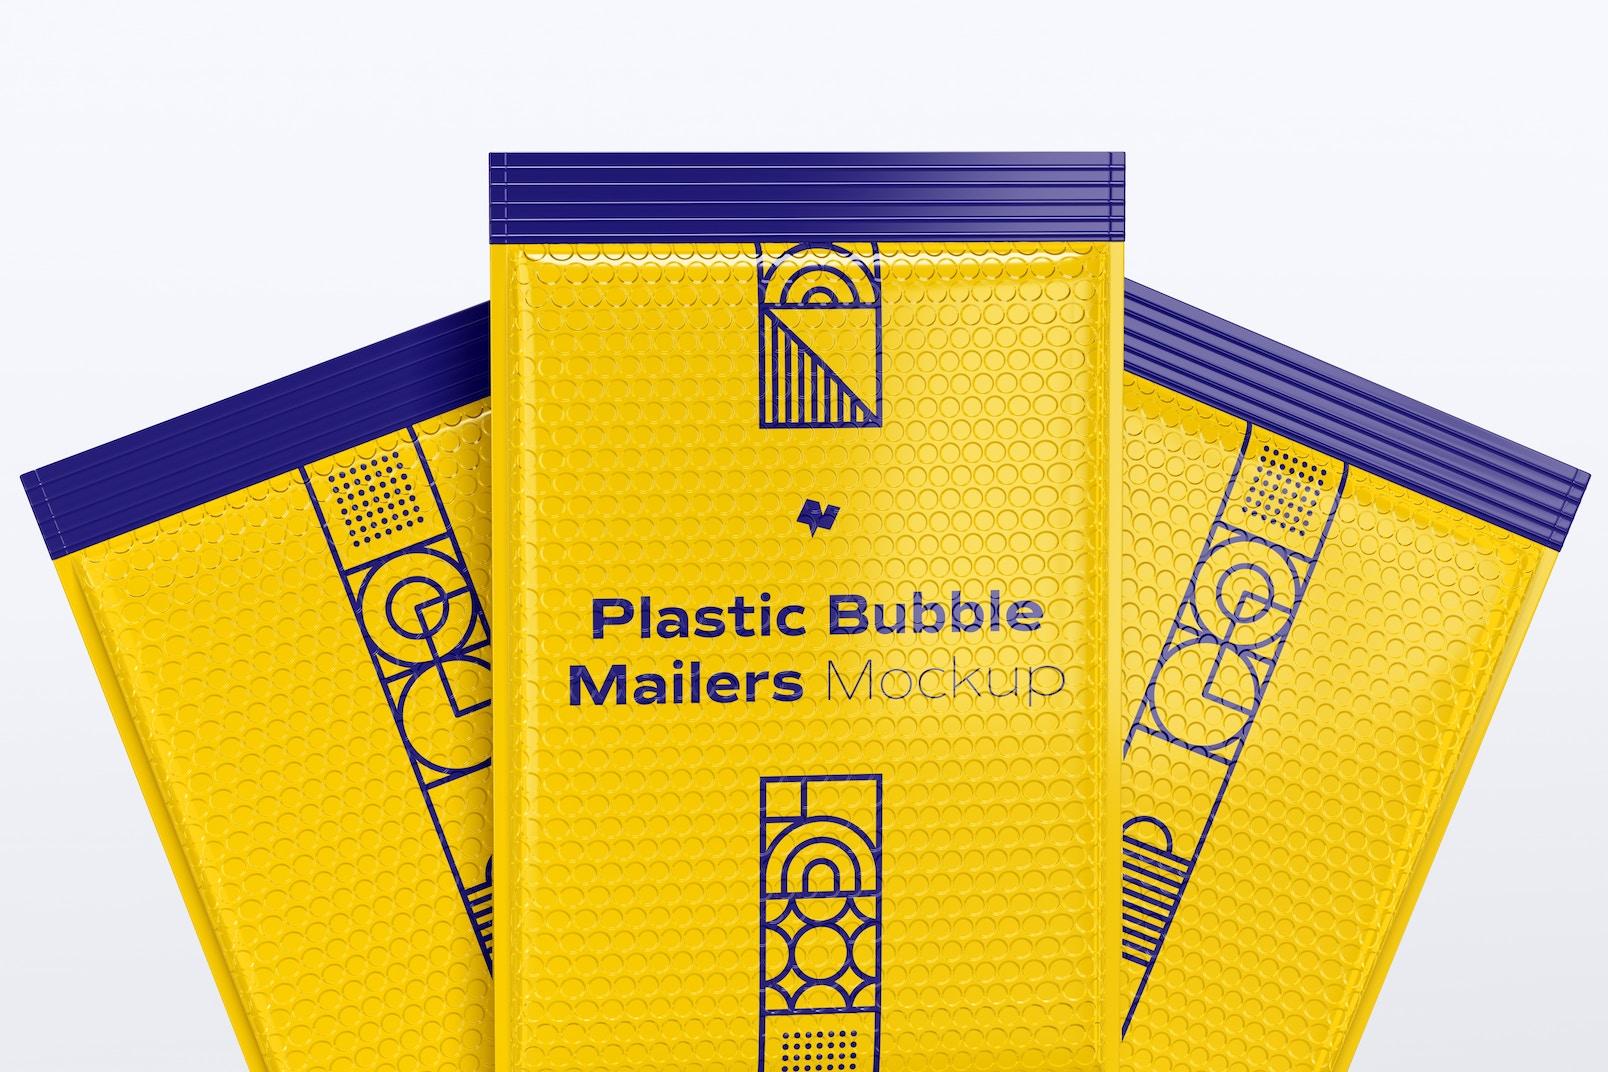 Plastic Bubble Mailers Set Mockup